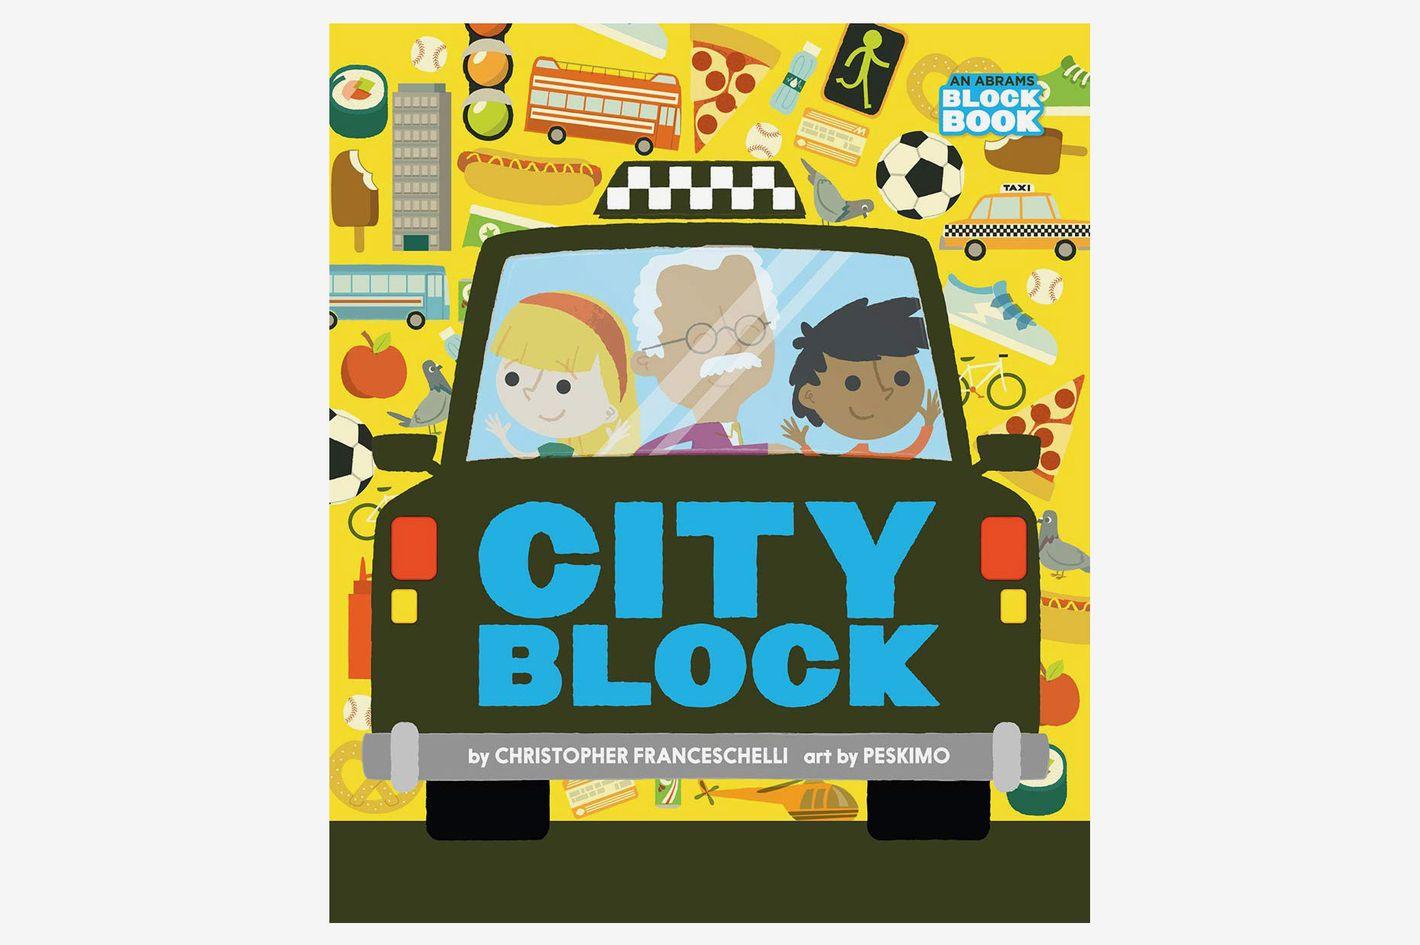 """Cityblock"" by Christopher Franceschelli  (Author), Peskimo (Illustrator)"